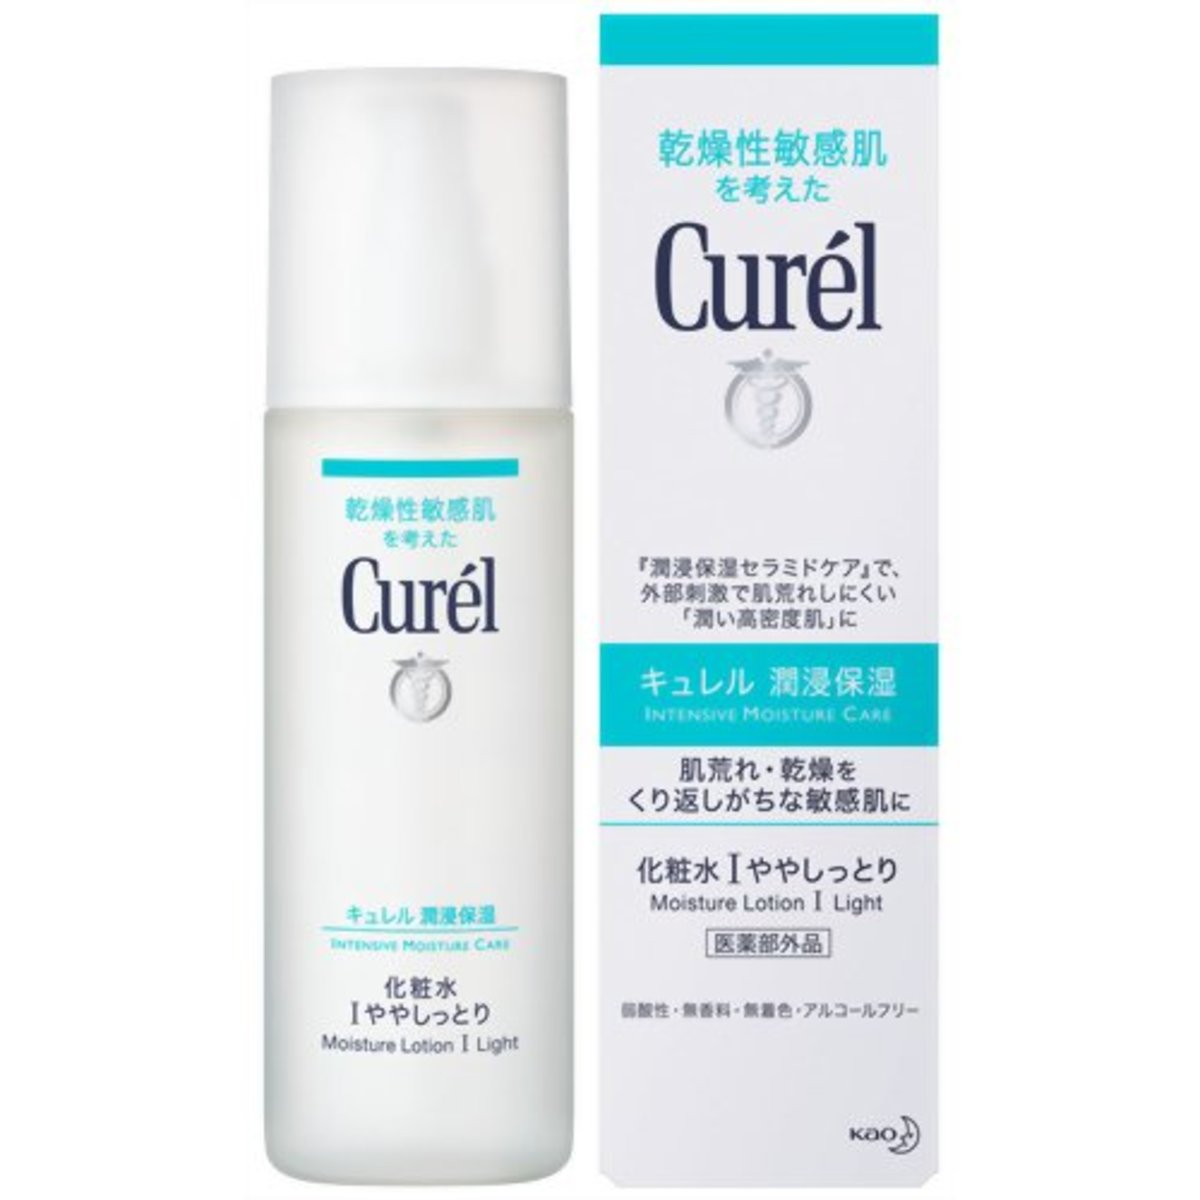 日本 KAO Curel Moisture Lotion I - Light  花王 珂潤 乾燥性敏感肌化妝水 I - 清爽型 150ml(4901301236043)